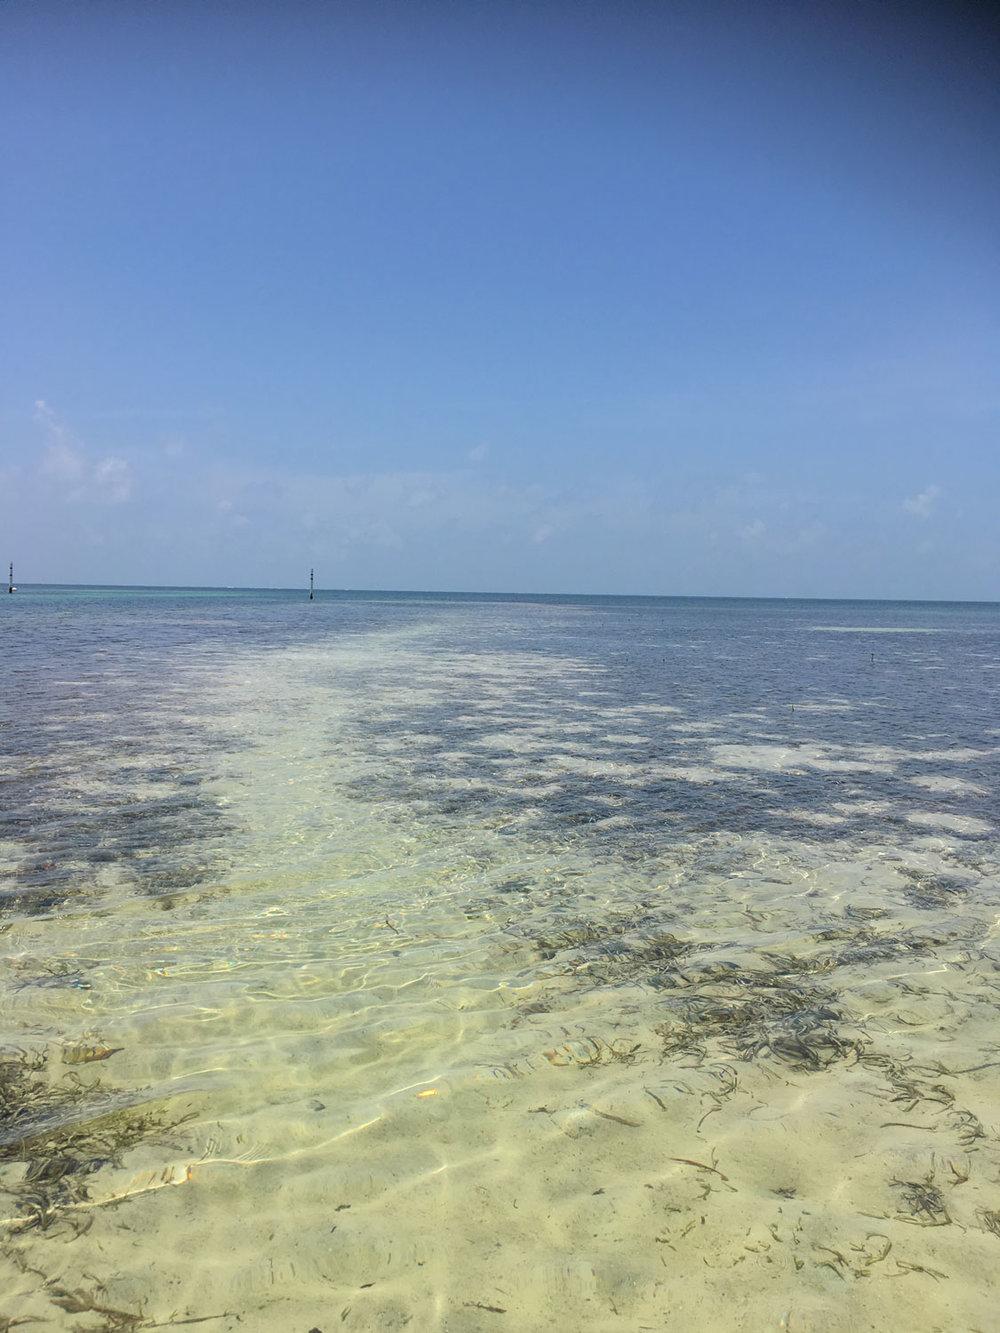 Hammocks_and_Ruins_Blog_Riviera_Maya_Mexico_Travel_Discover_Explore_Yucatan_Hammocks_Beaches_Near_Cancun_Punta_Nizuc_27.jpg